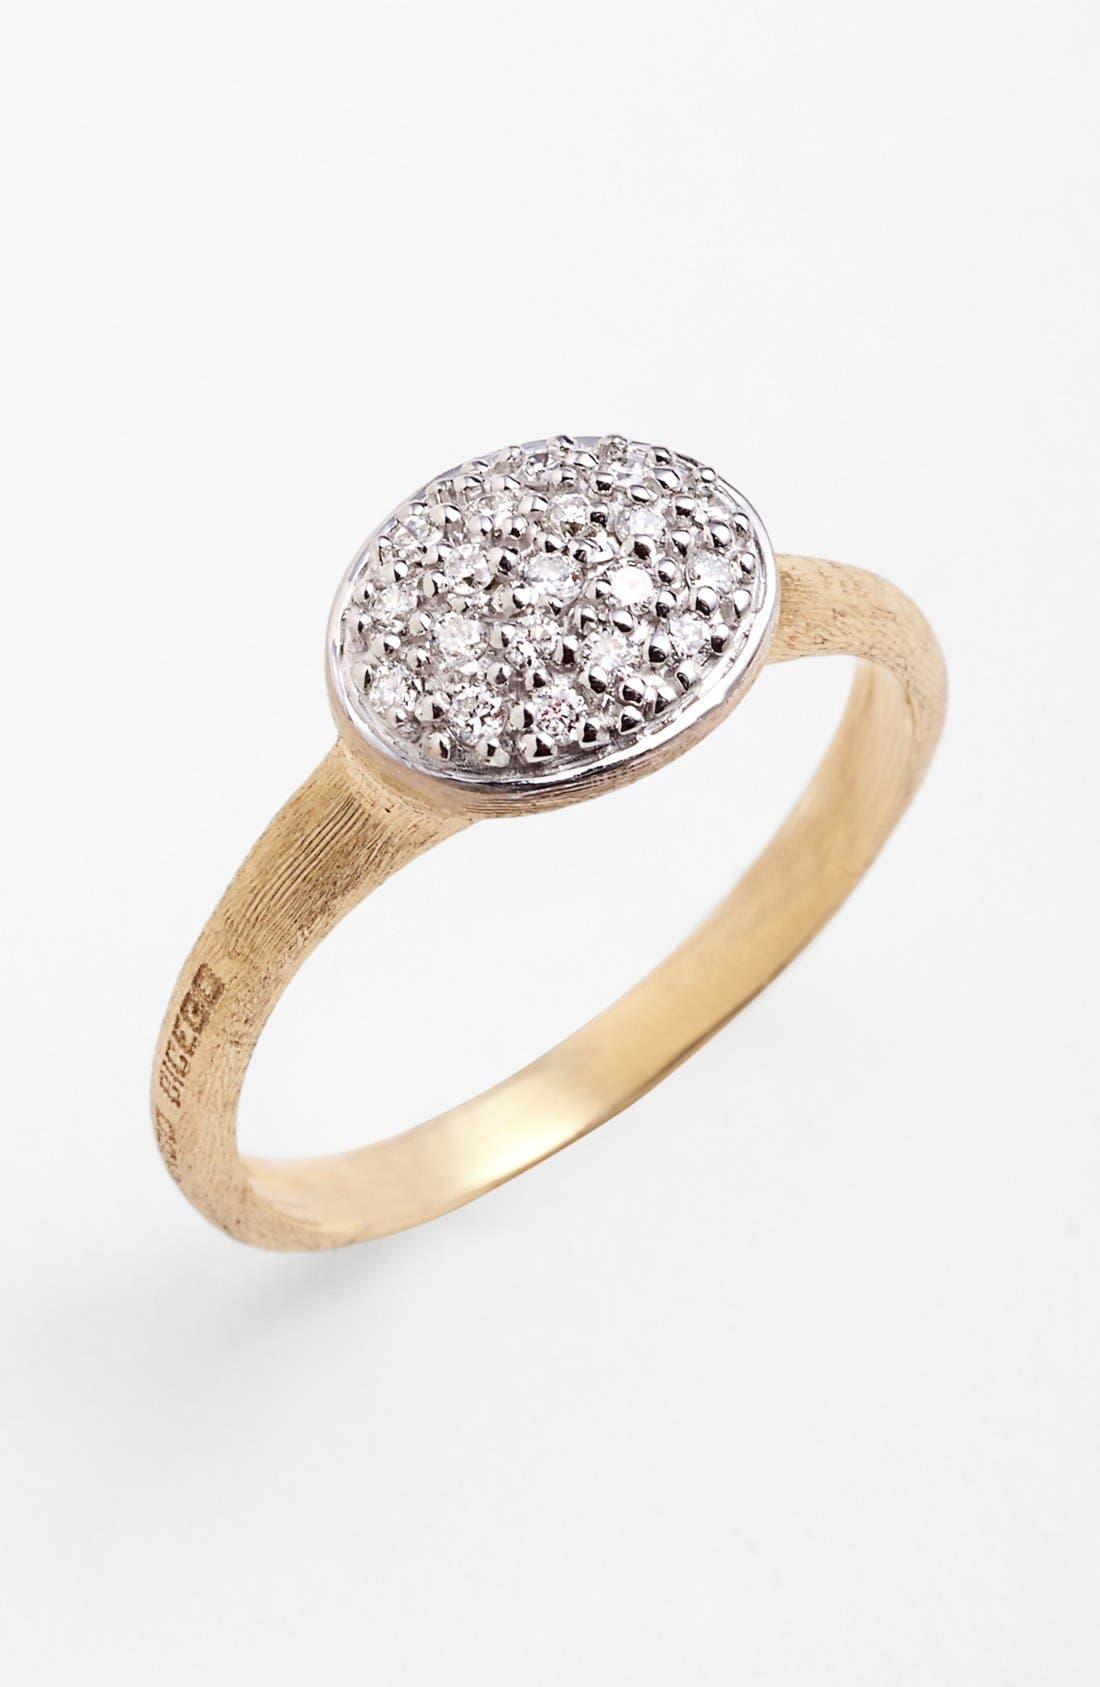 Main Image - Marco Bicego 'Siviglia' Small Diamond Cocktail Ring